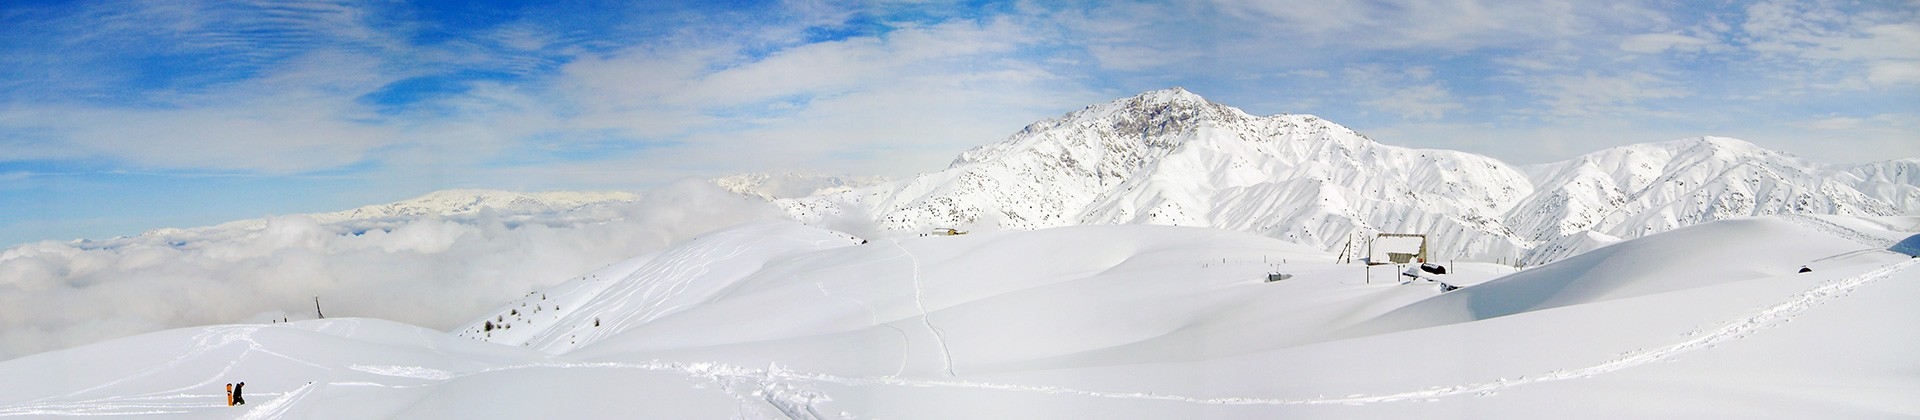 Beldersay Ski Track - 1